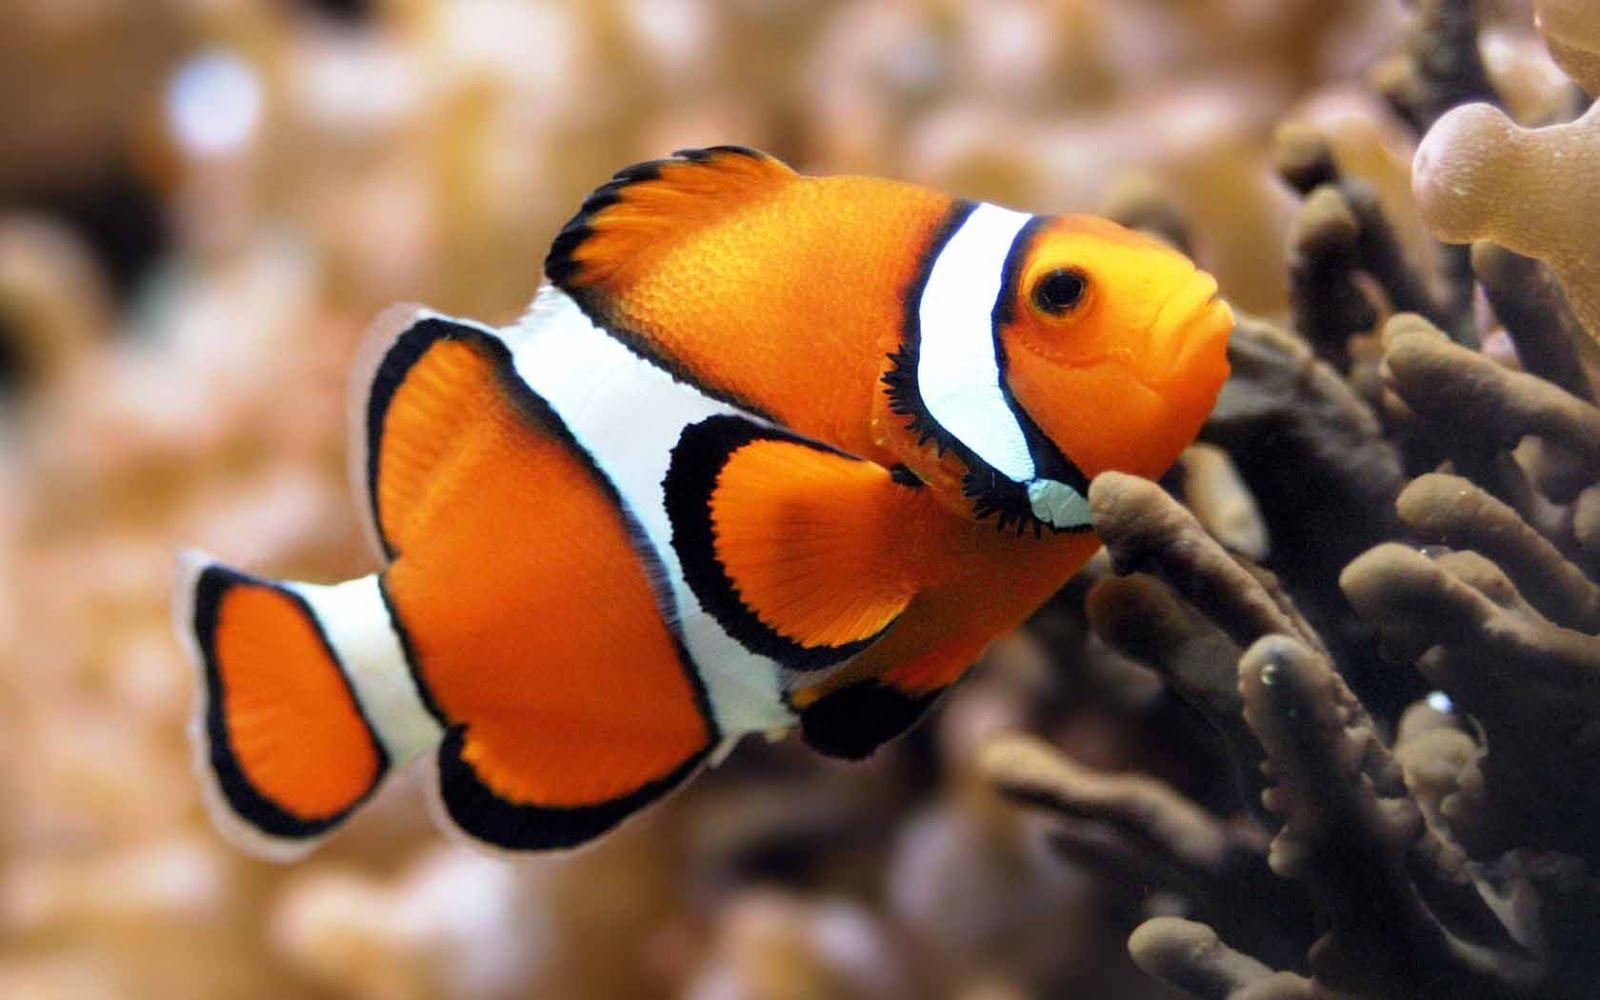 Fish Hd Wallpaper Clown Fish Marine Fish Sea Fish